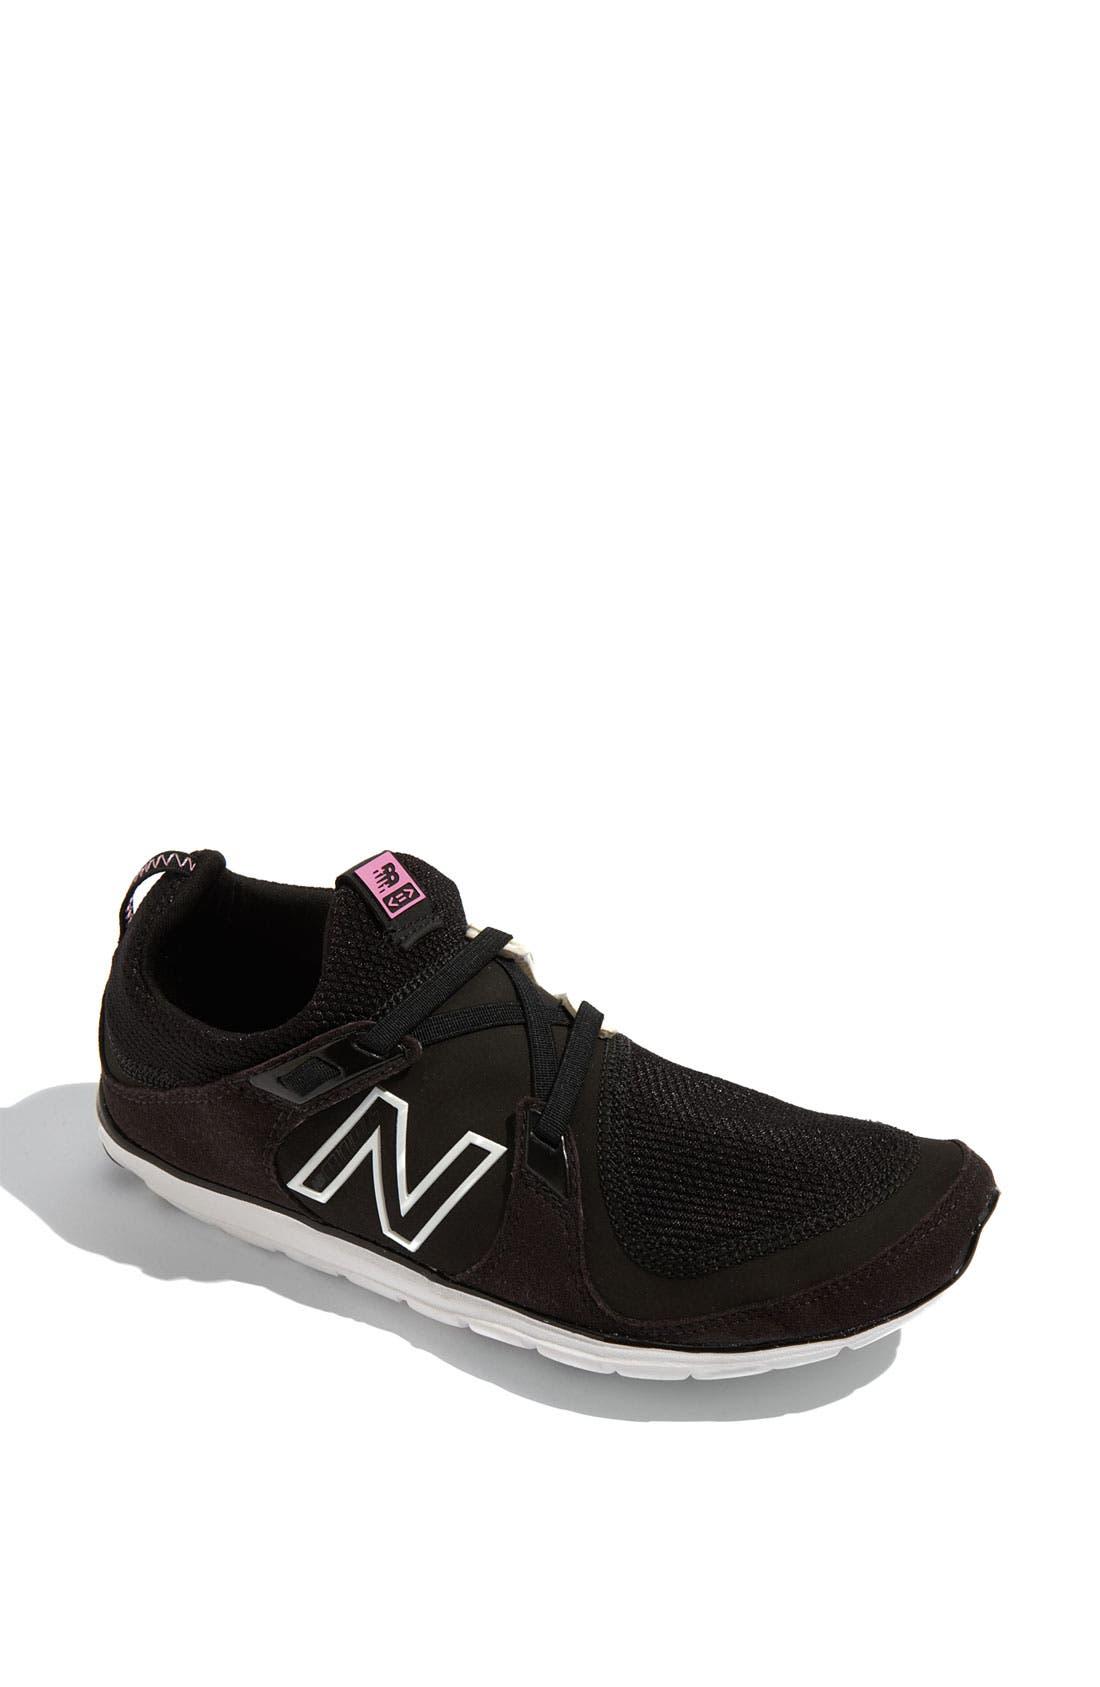 Main Image - New Balance 'Minimus' Walking Shoe (Women)